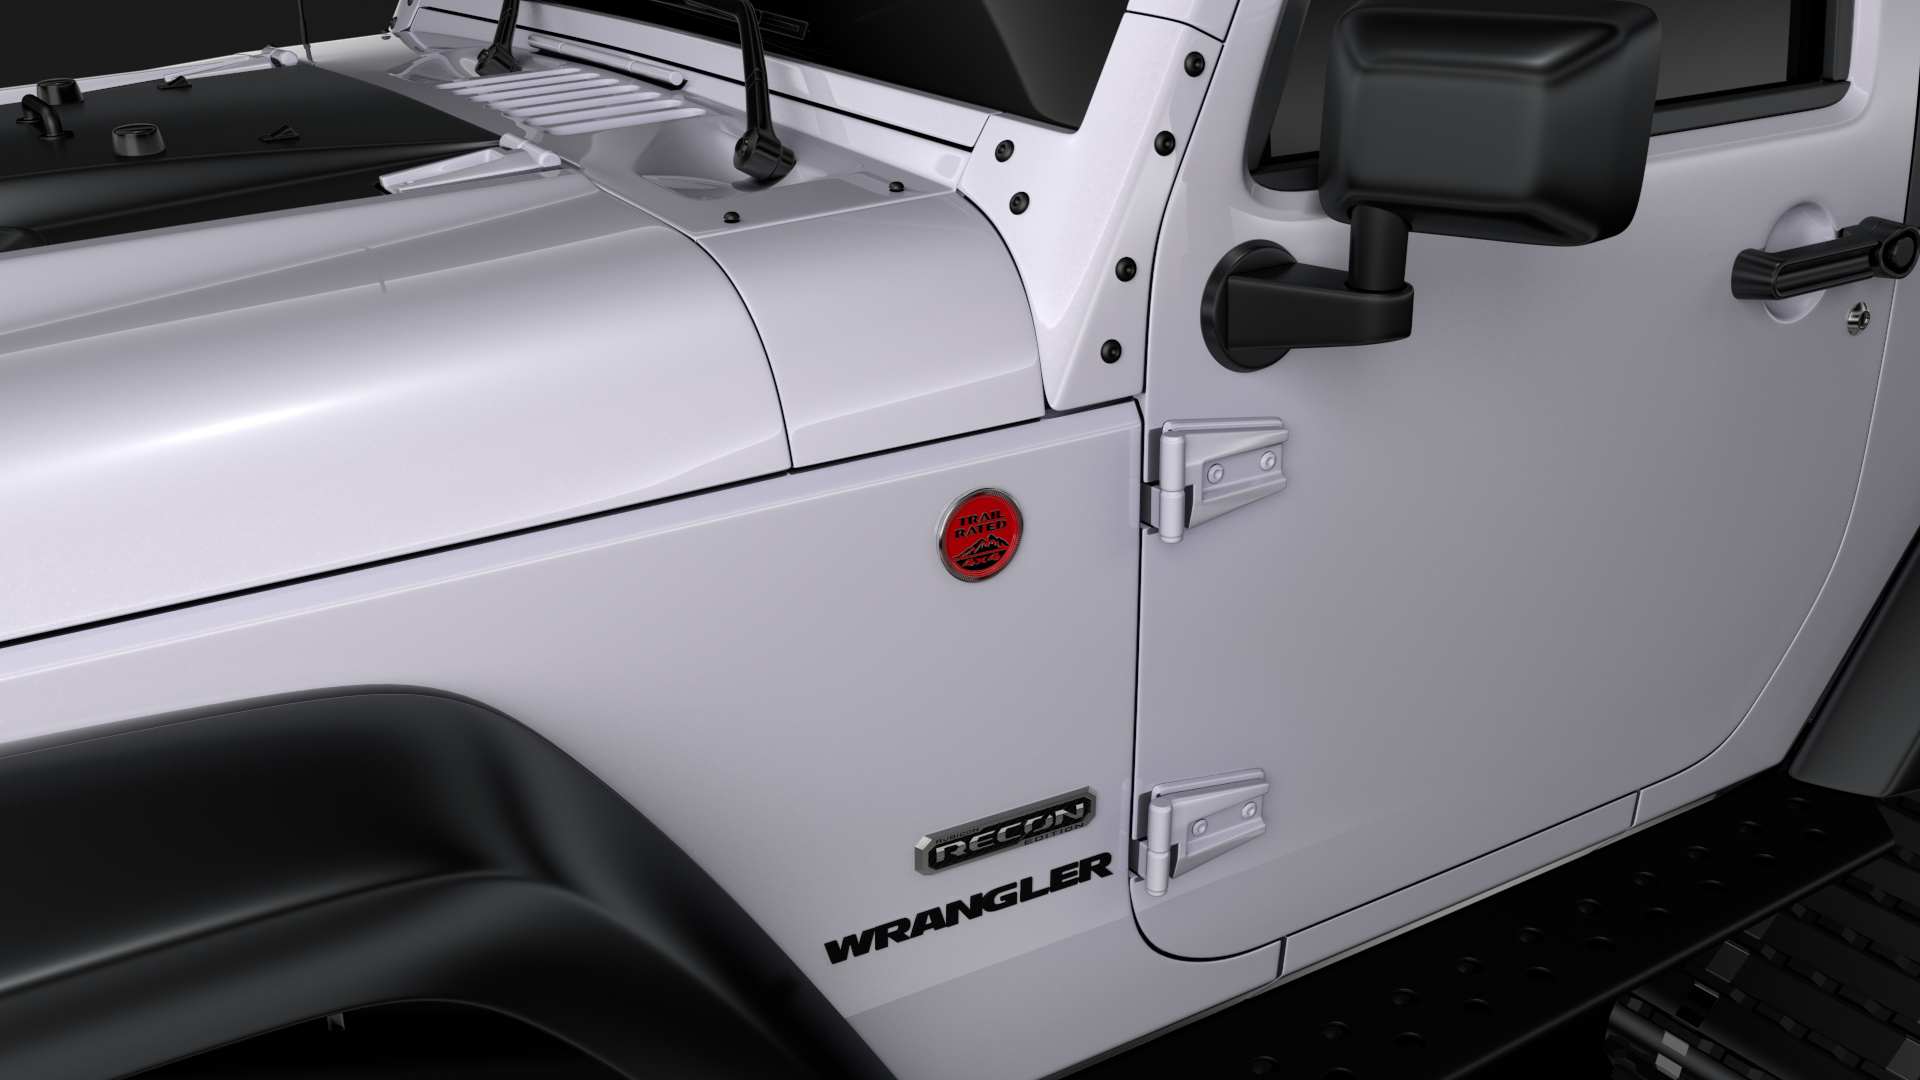 jeep wrangler crawler rubicon recon jk 2017 3d model max fbx c4d lwo ma mb hrc xsi obj 276917